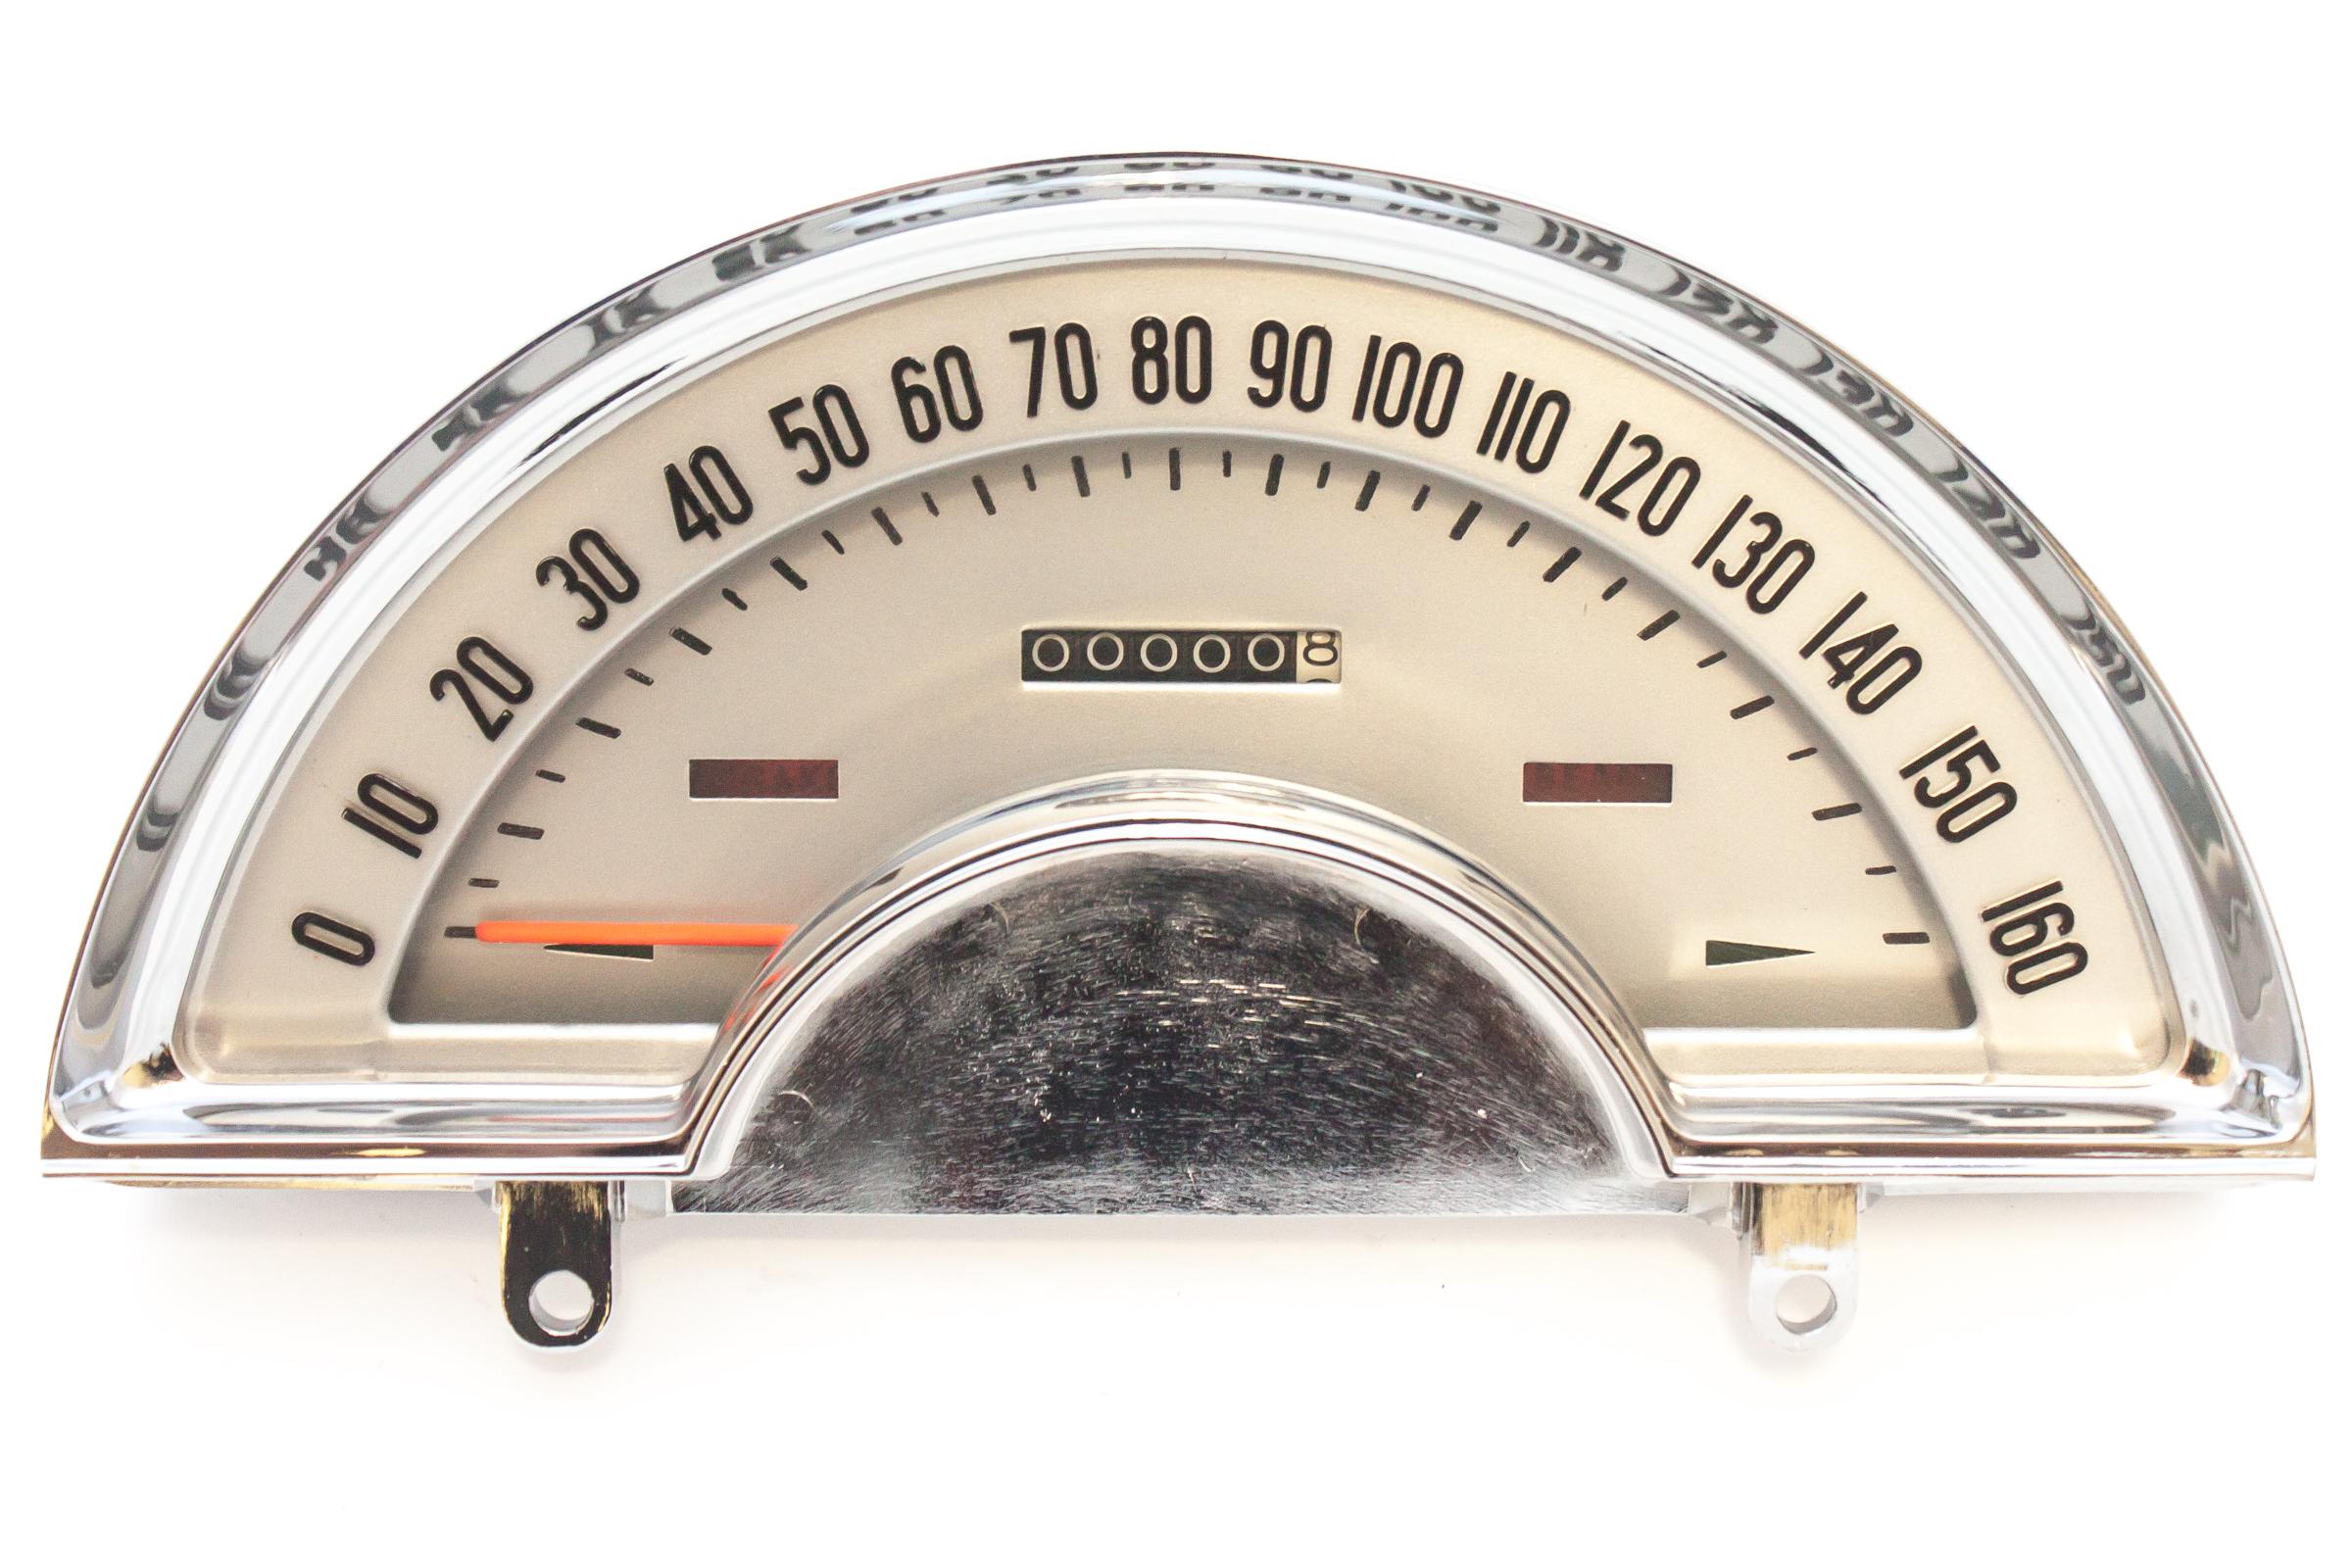 Speedometer Repair and Restoration for Classic Cars